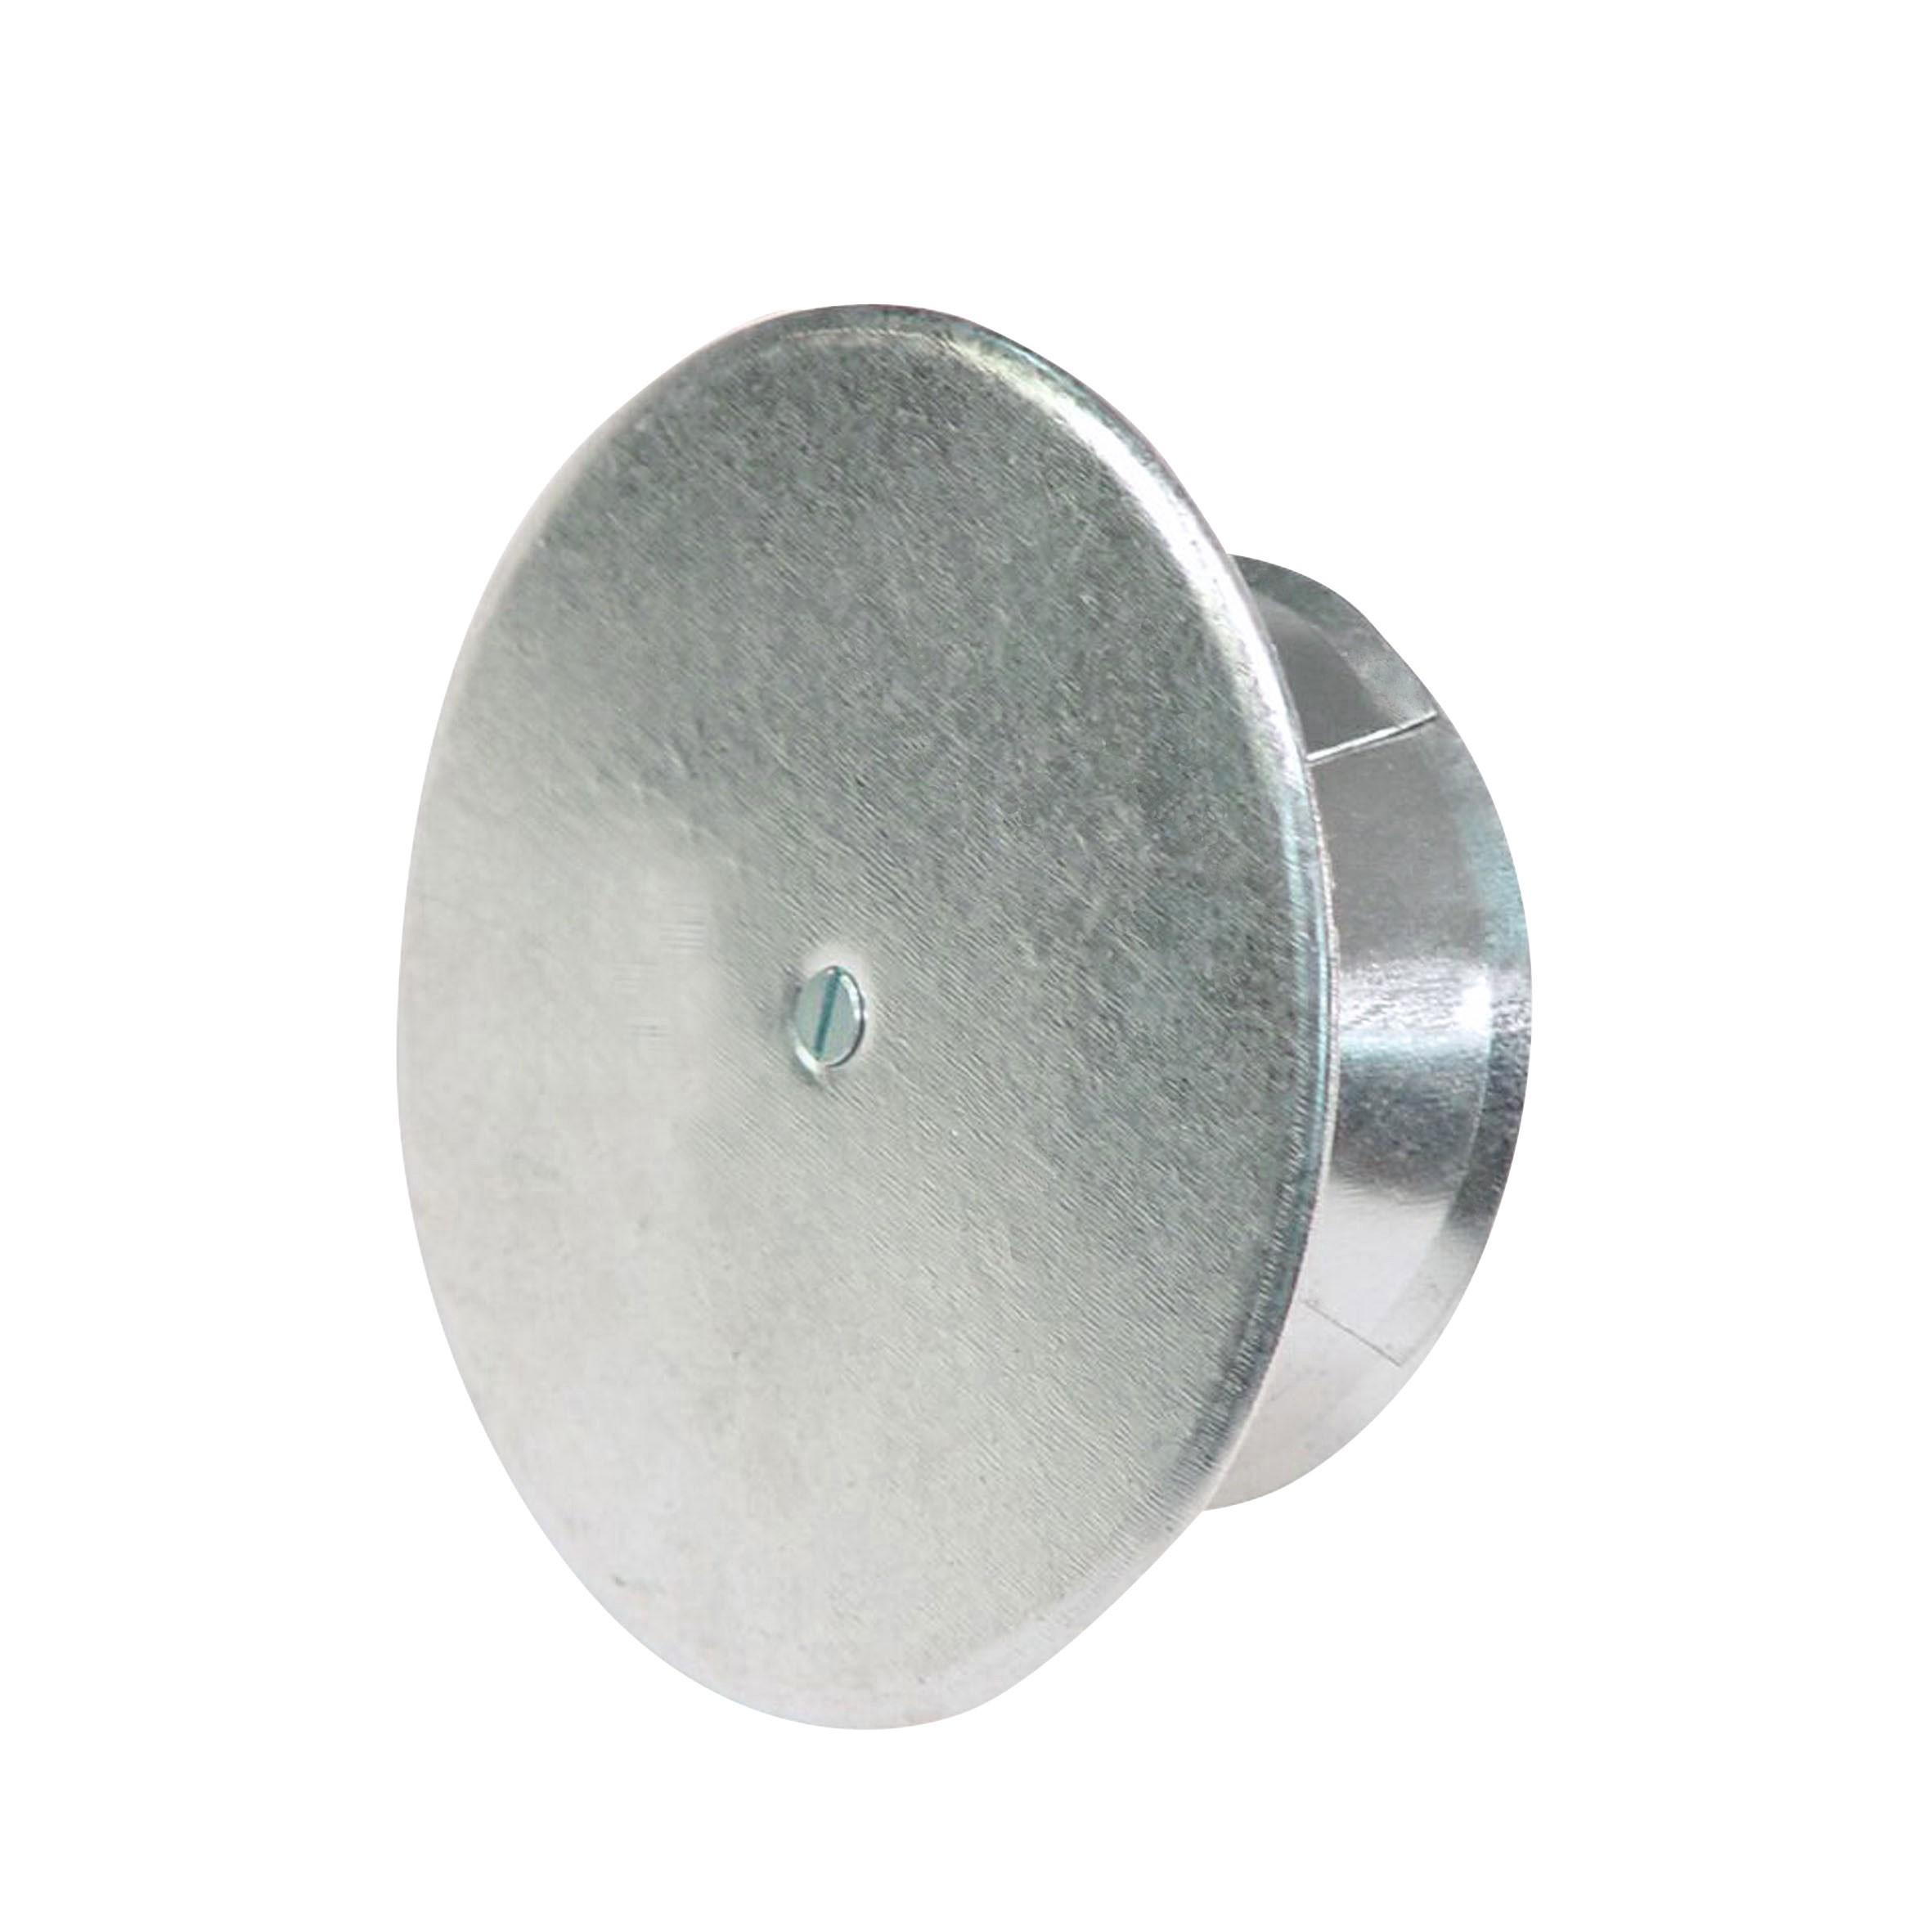 Kaminlochkapsel KaminoFlam Ø 160 mm für Maueröffnung Ø 100-150 mm Bild 1